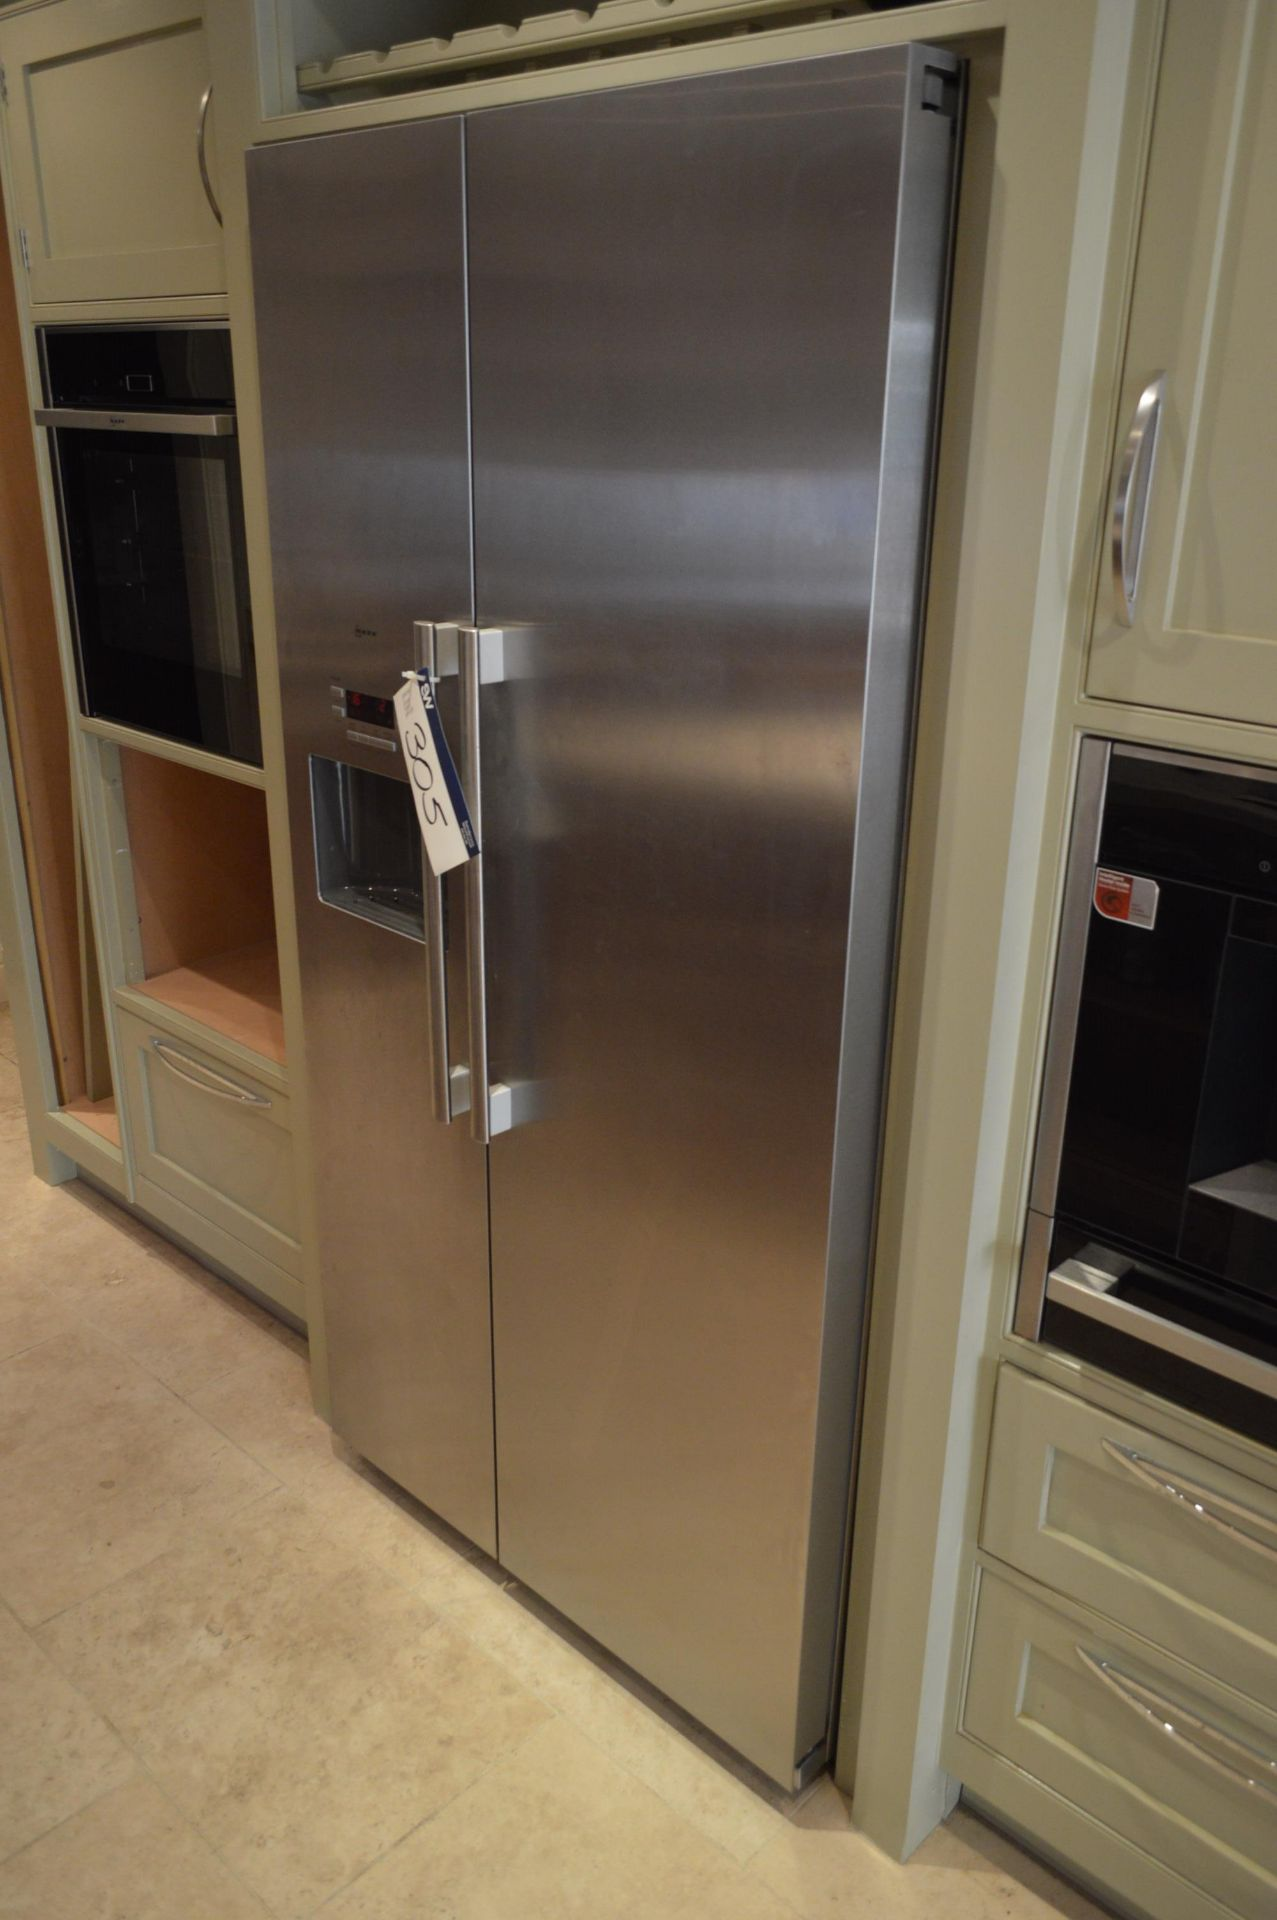 Lot 305 - Neff KAP90 Brushed Stainless Steel American Type Fridge Freezer, serial no. K3990X7GB/10, 900mm x